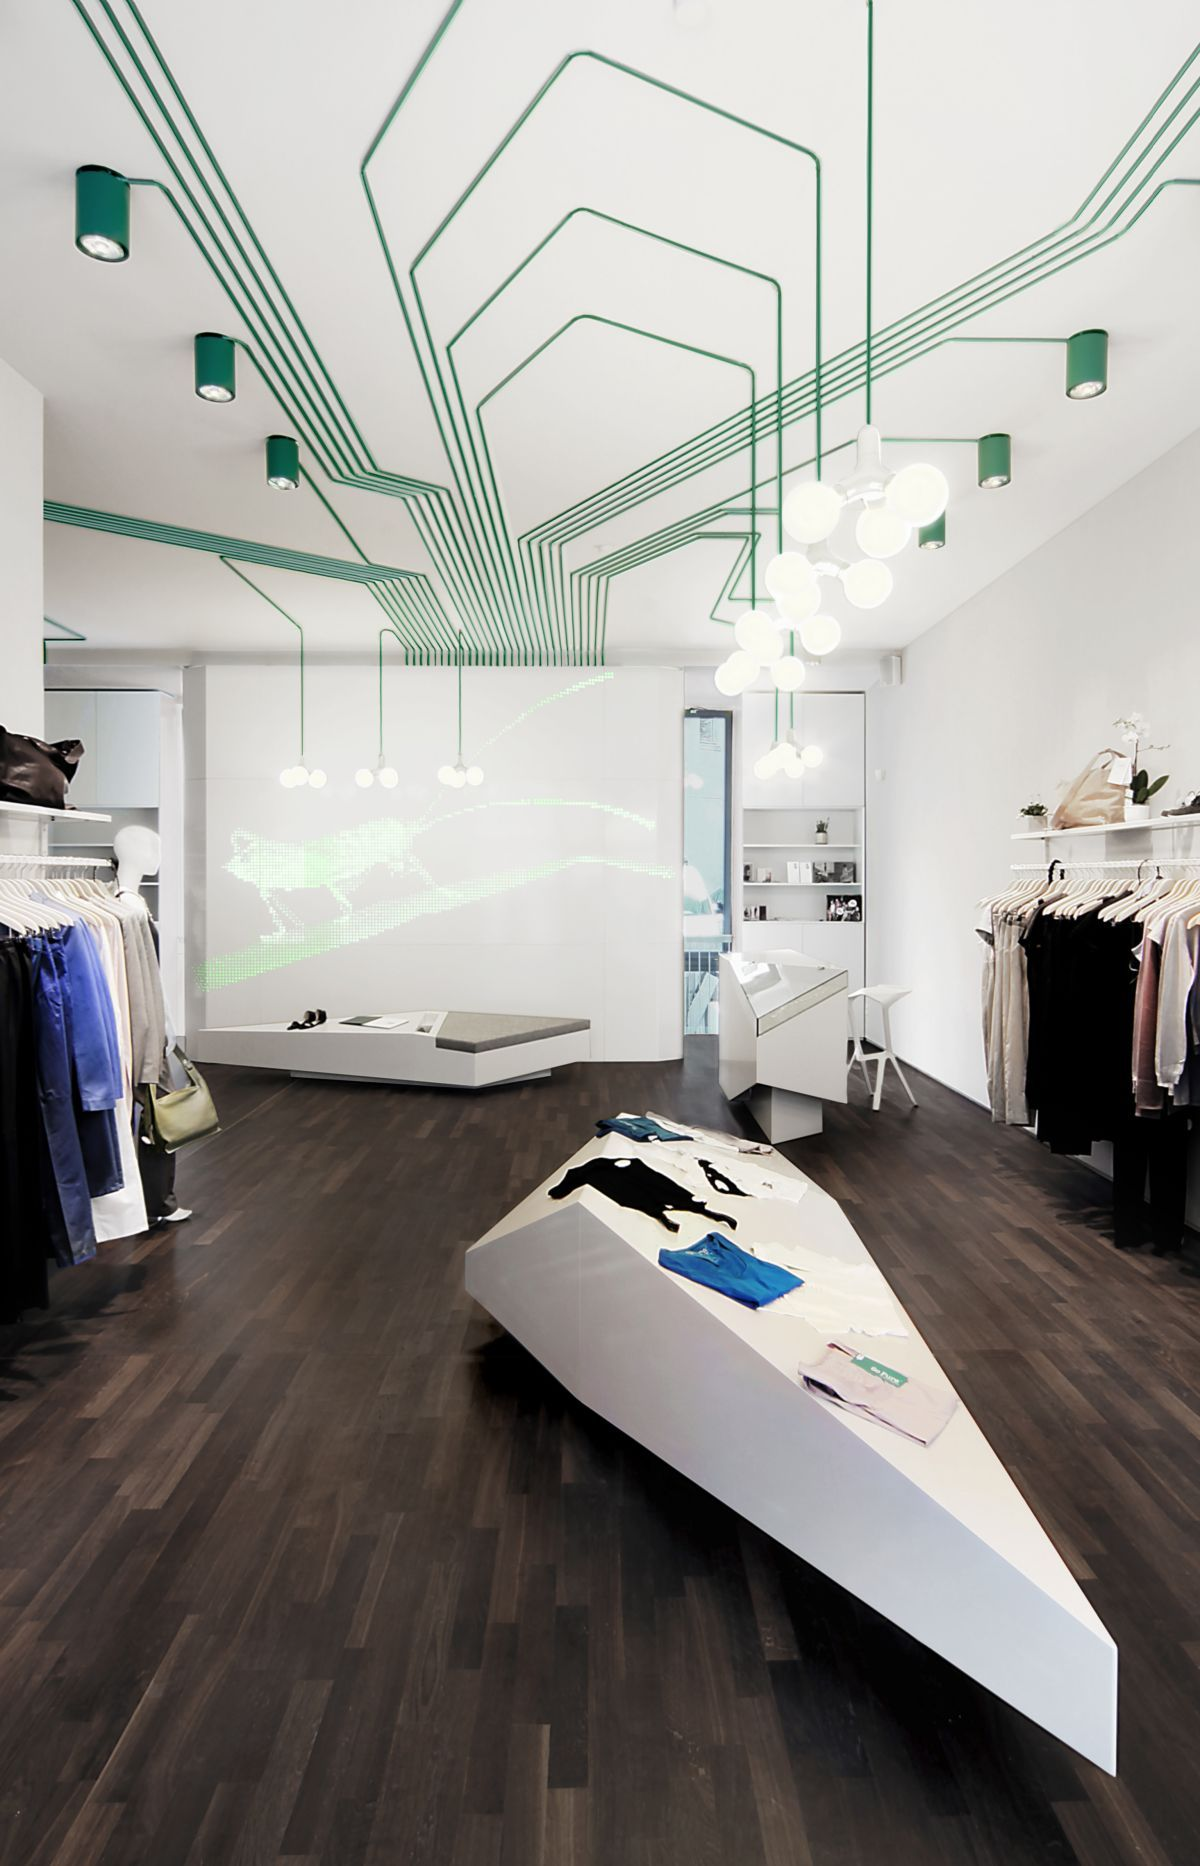 Modern fashion shop interior design with wooden floor for inspirational fashion shop interior design ideas